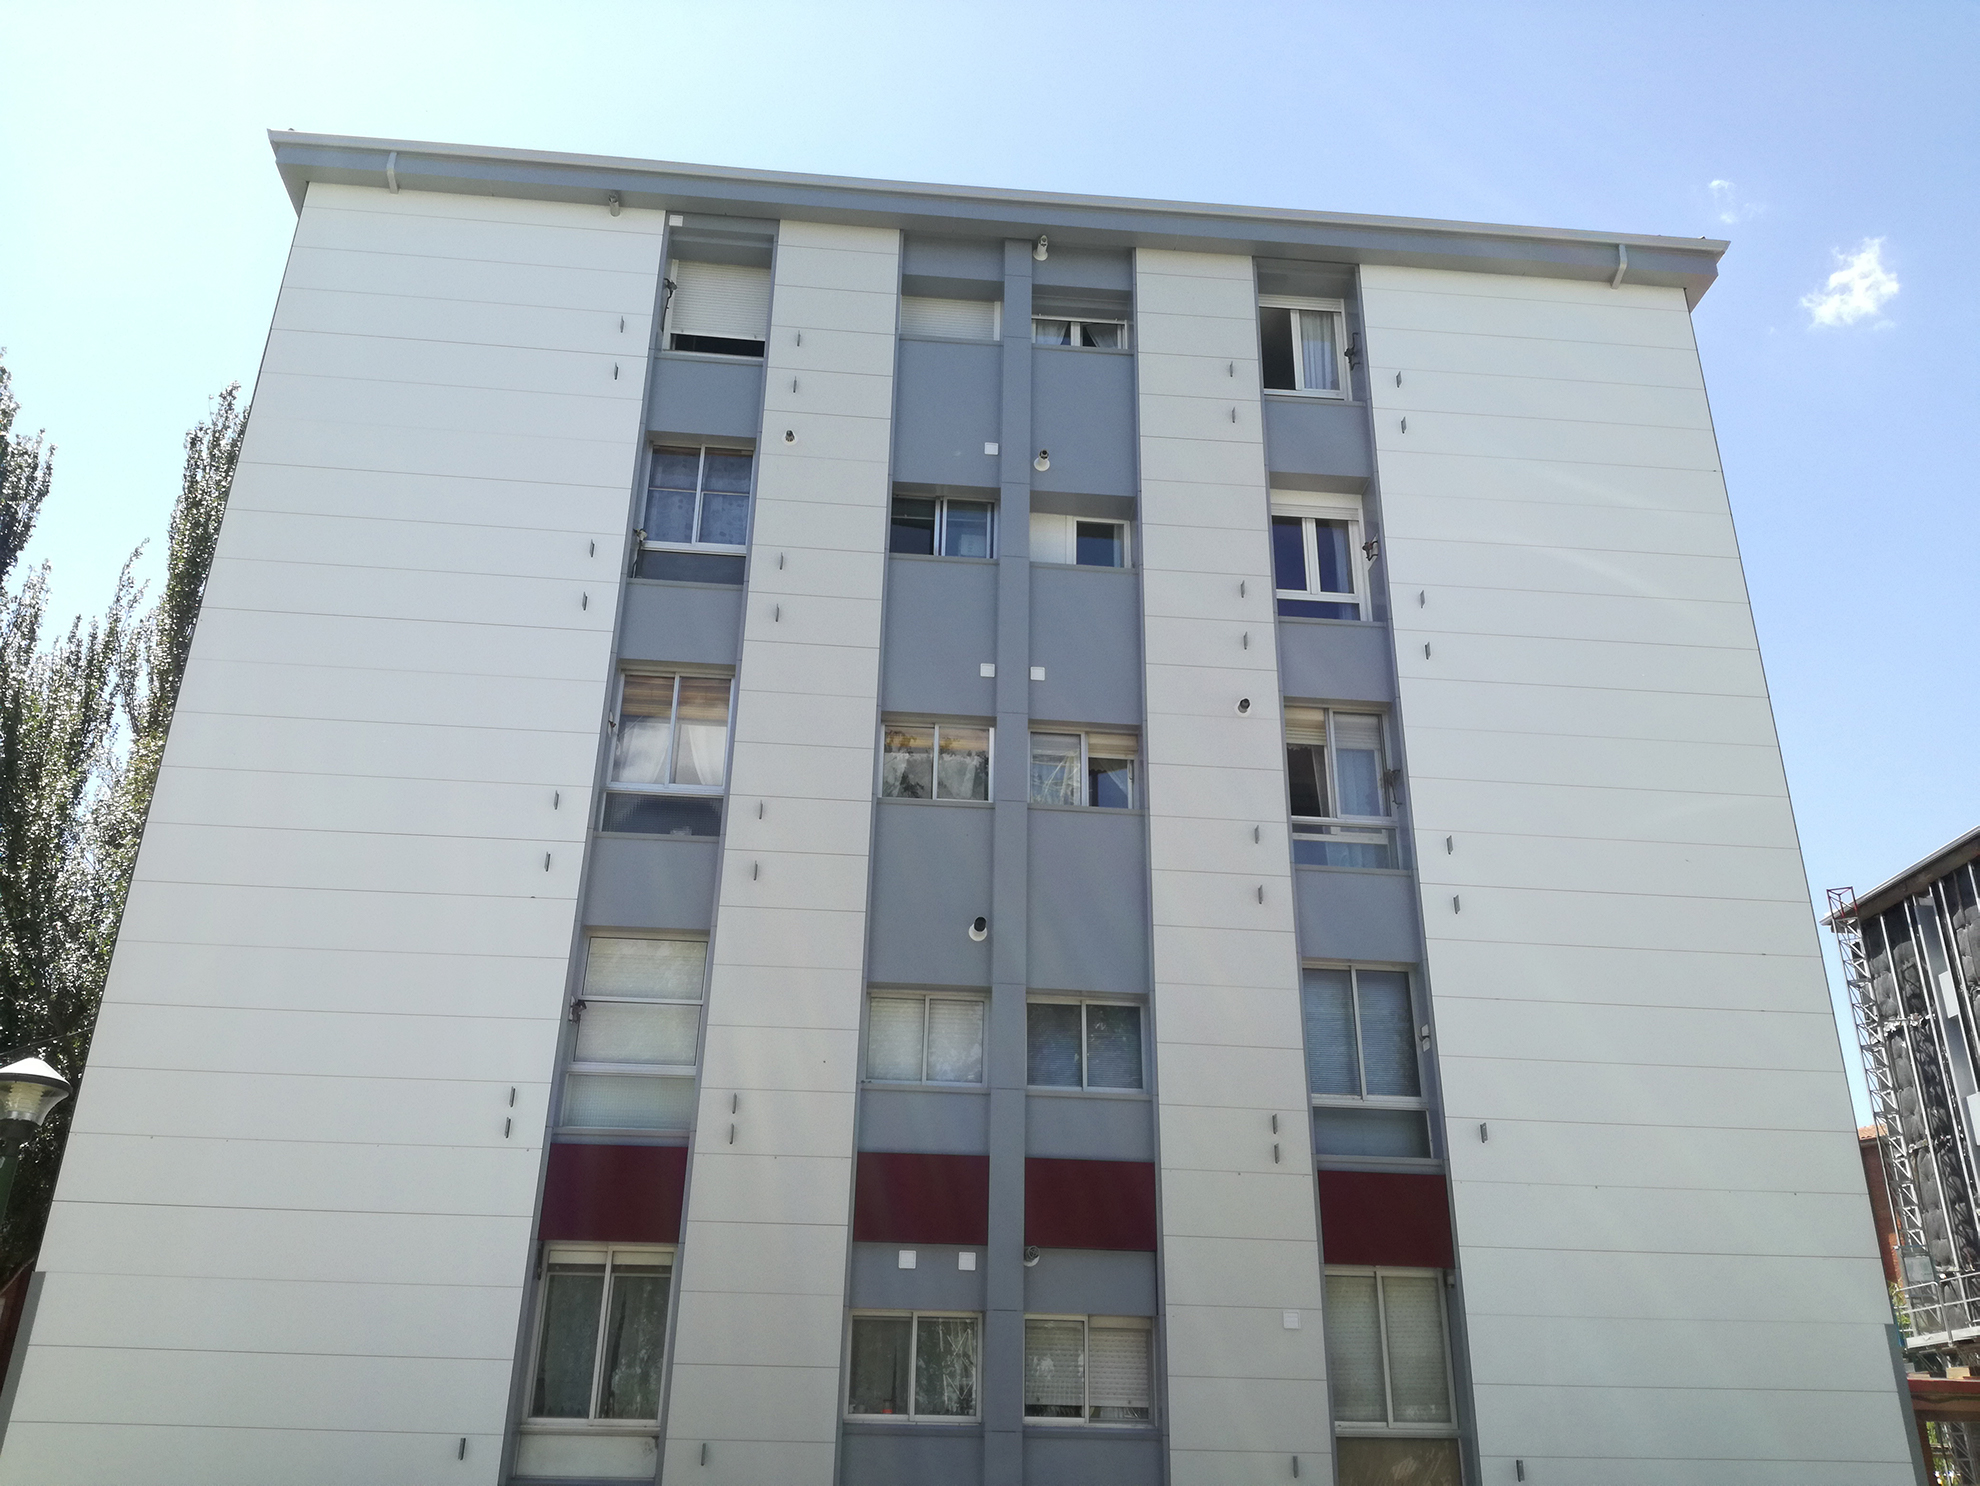 Edificio-Sahagun-2_1585911794.jpg